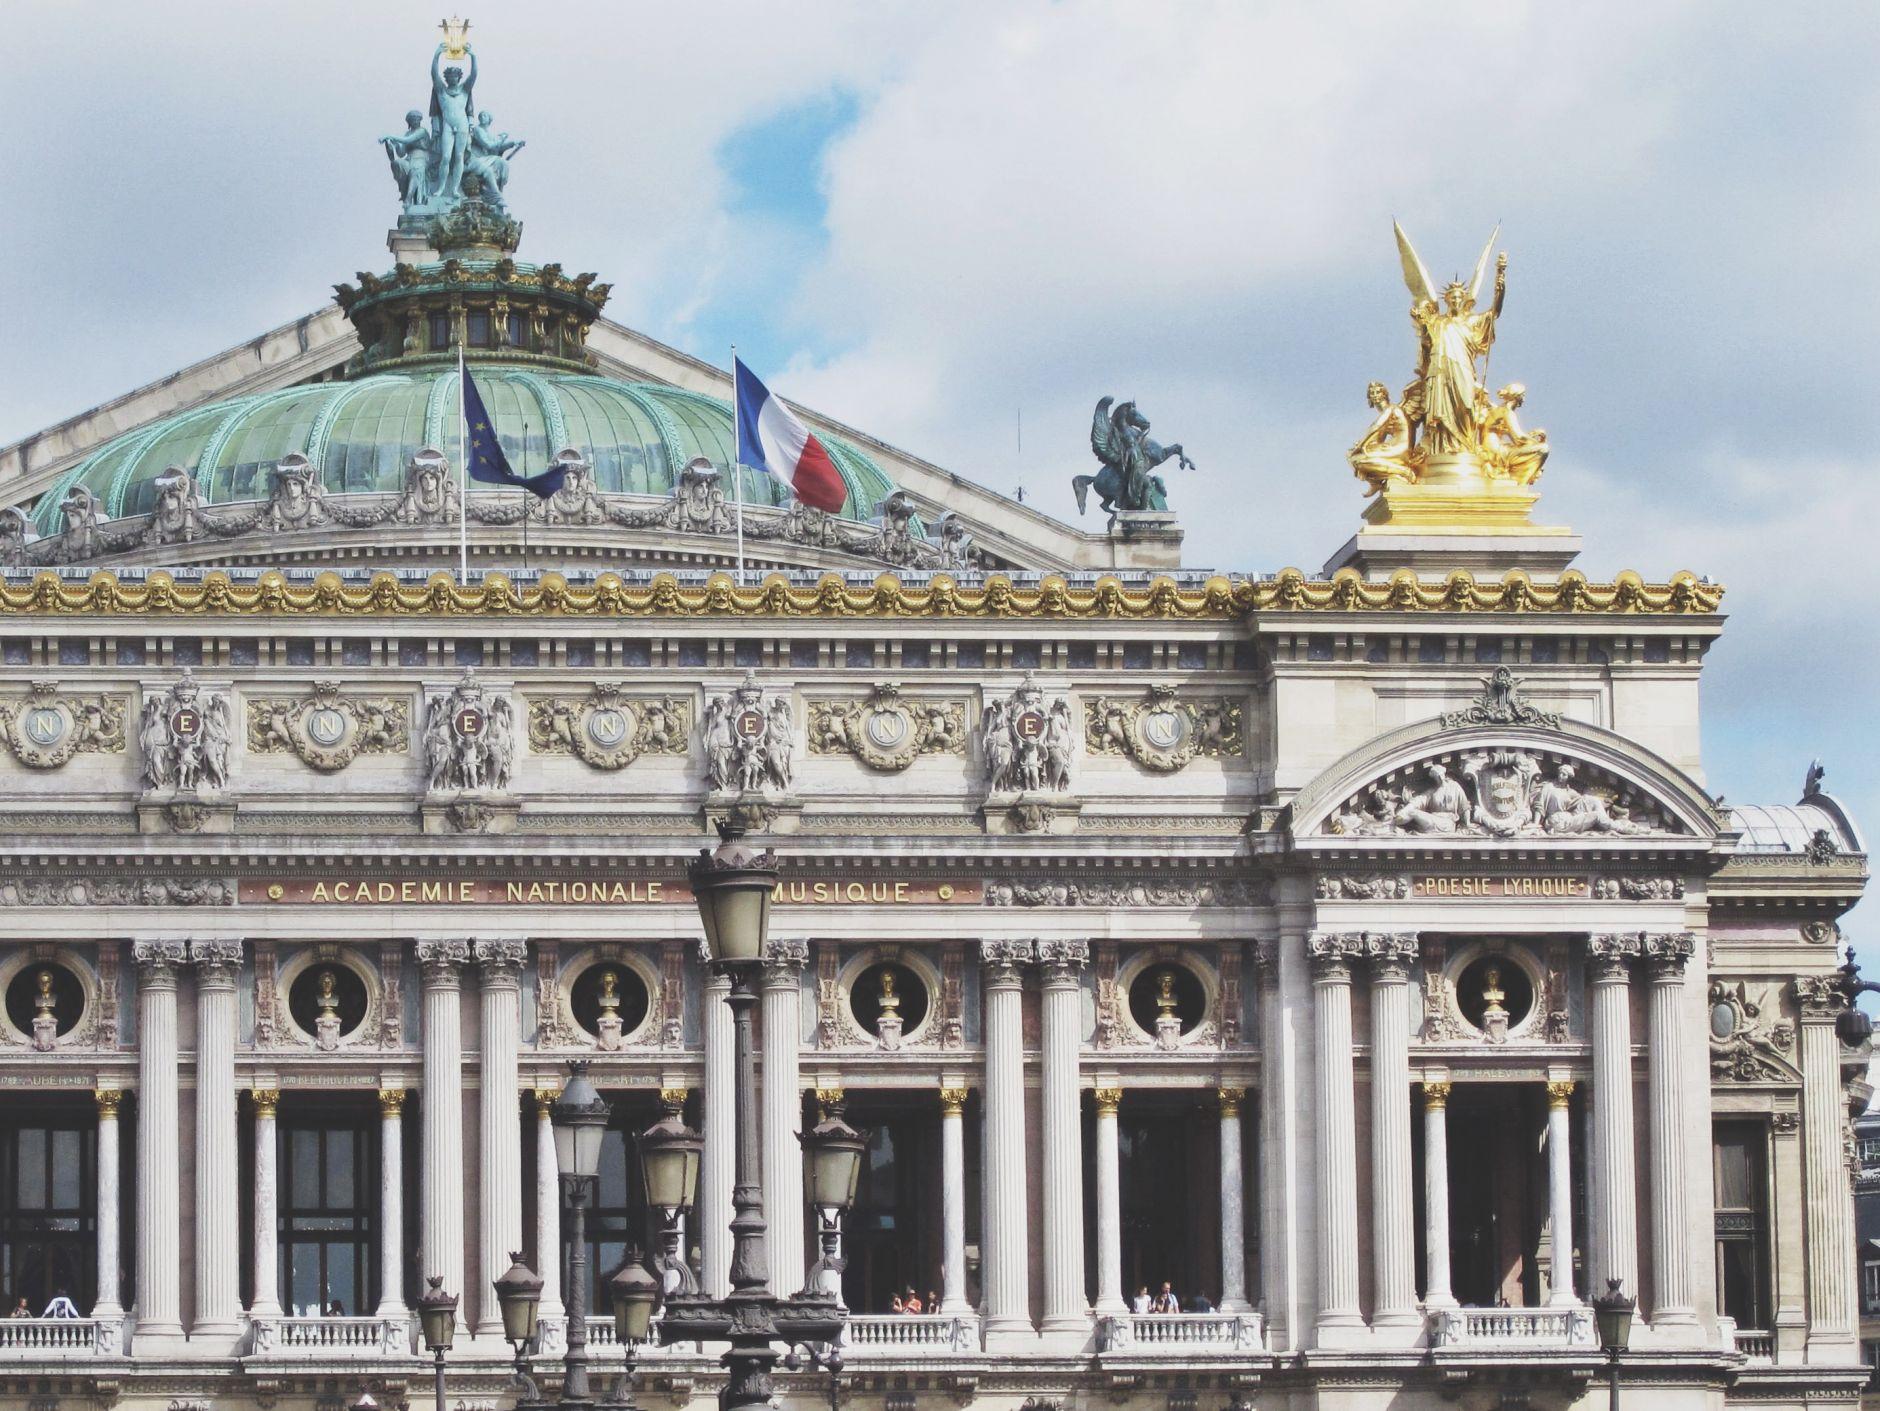 opera-house-paris-lafayette-shopping-disi-couture-01